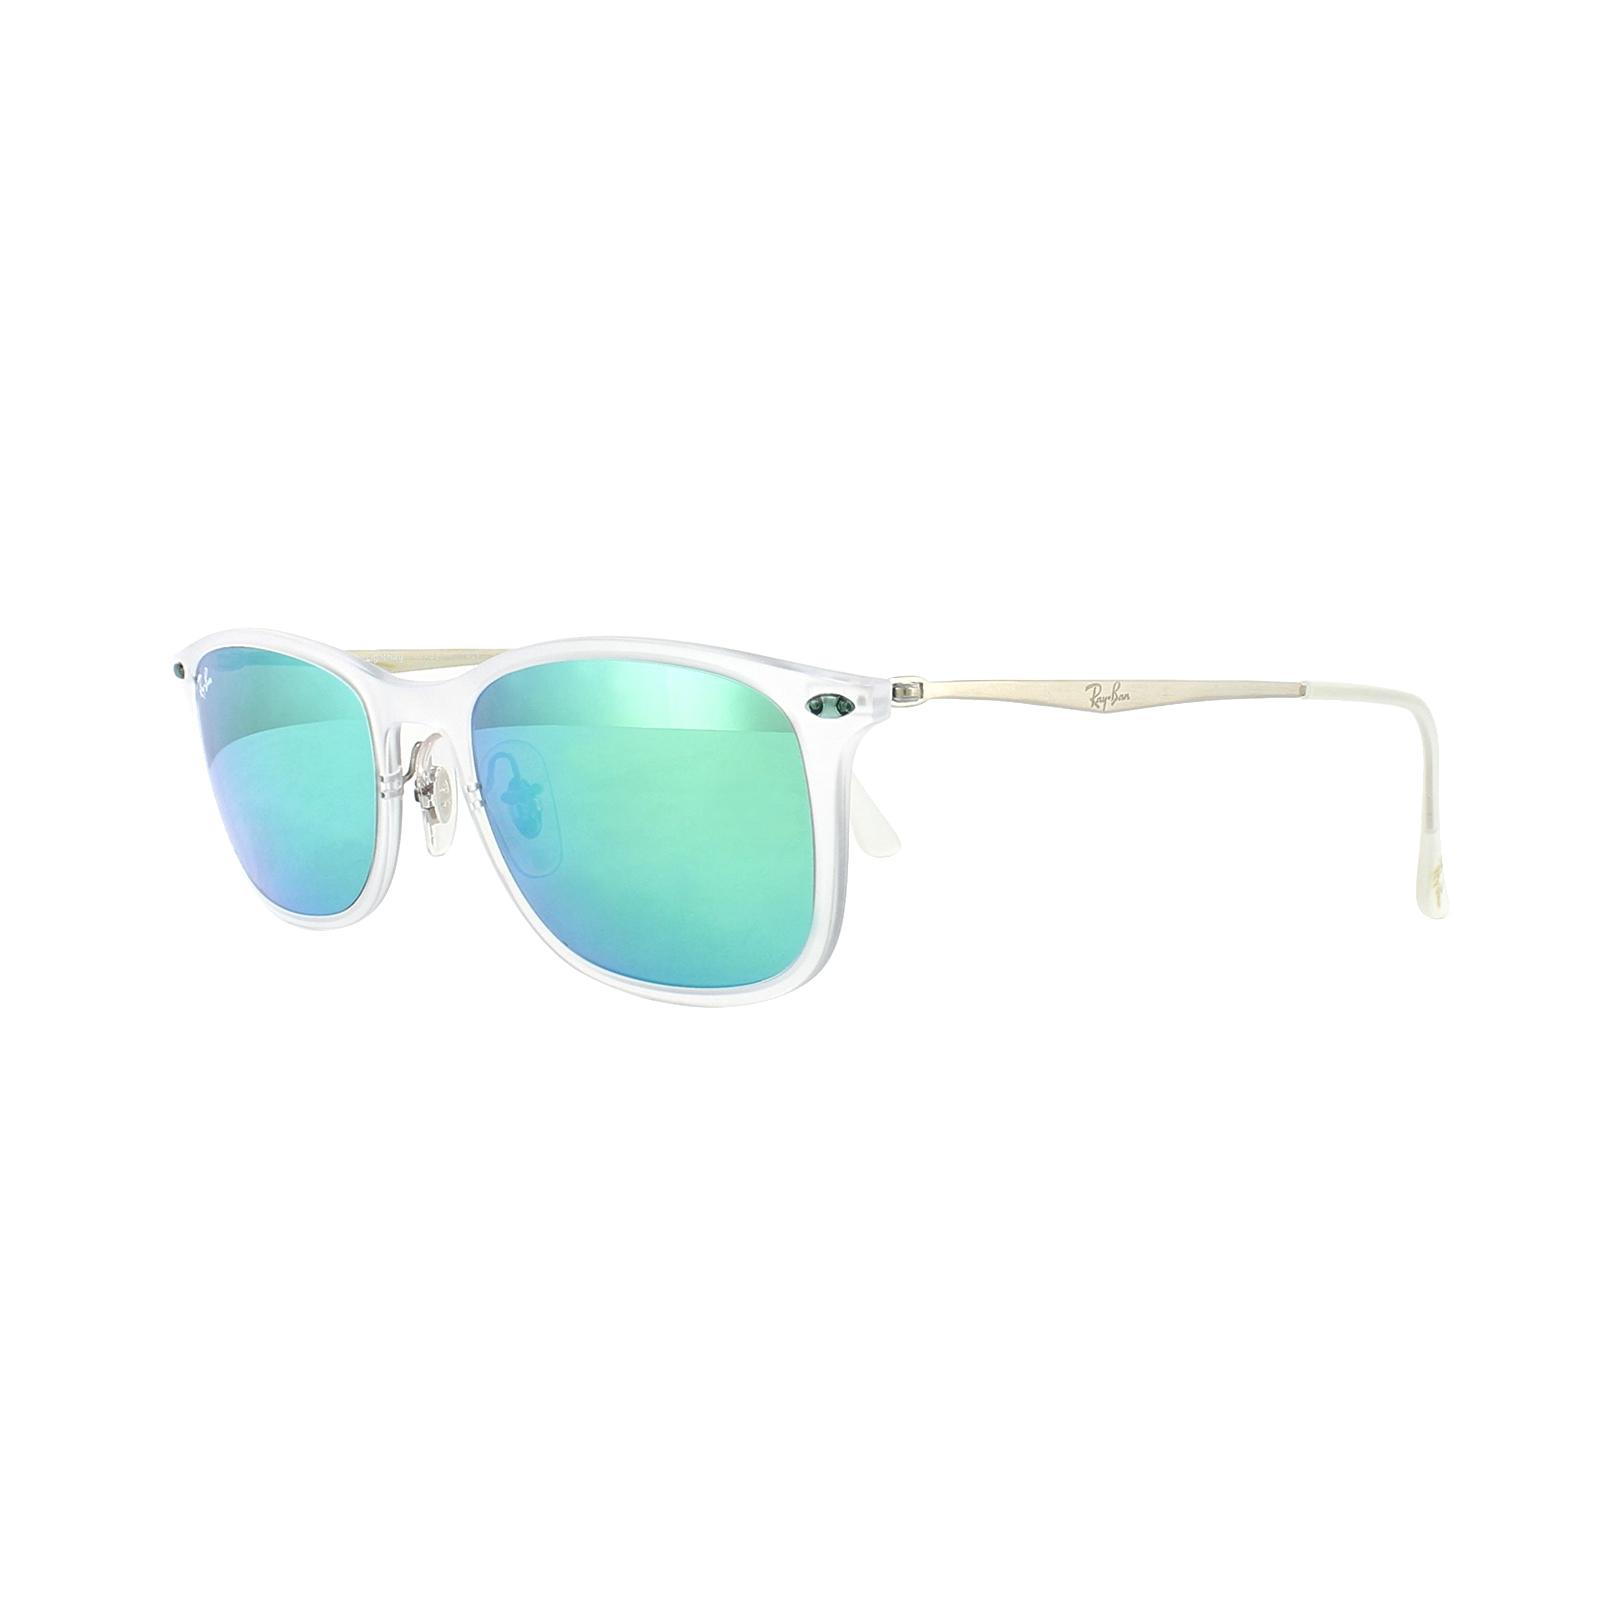 d44ce07f9fa9a Sentinel Ray-Ban Sunglasses New Wayfarer Light Ray 4225 646 3R Transparent  Green Mirror